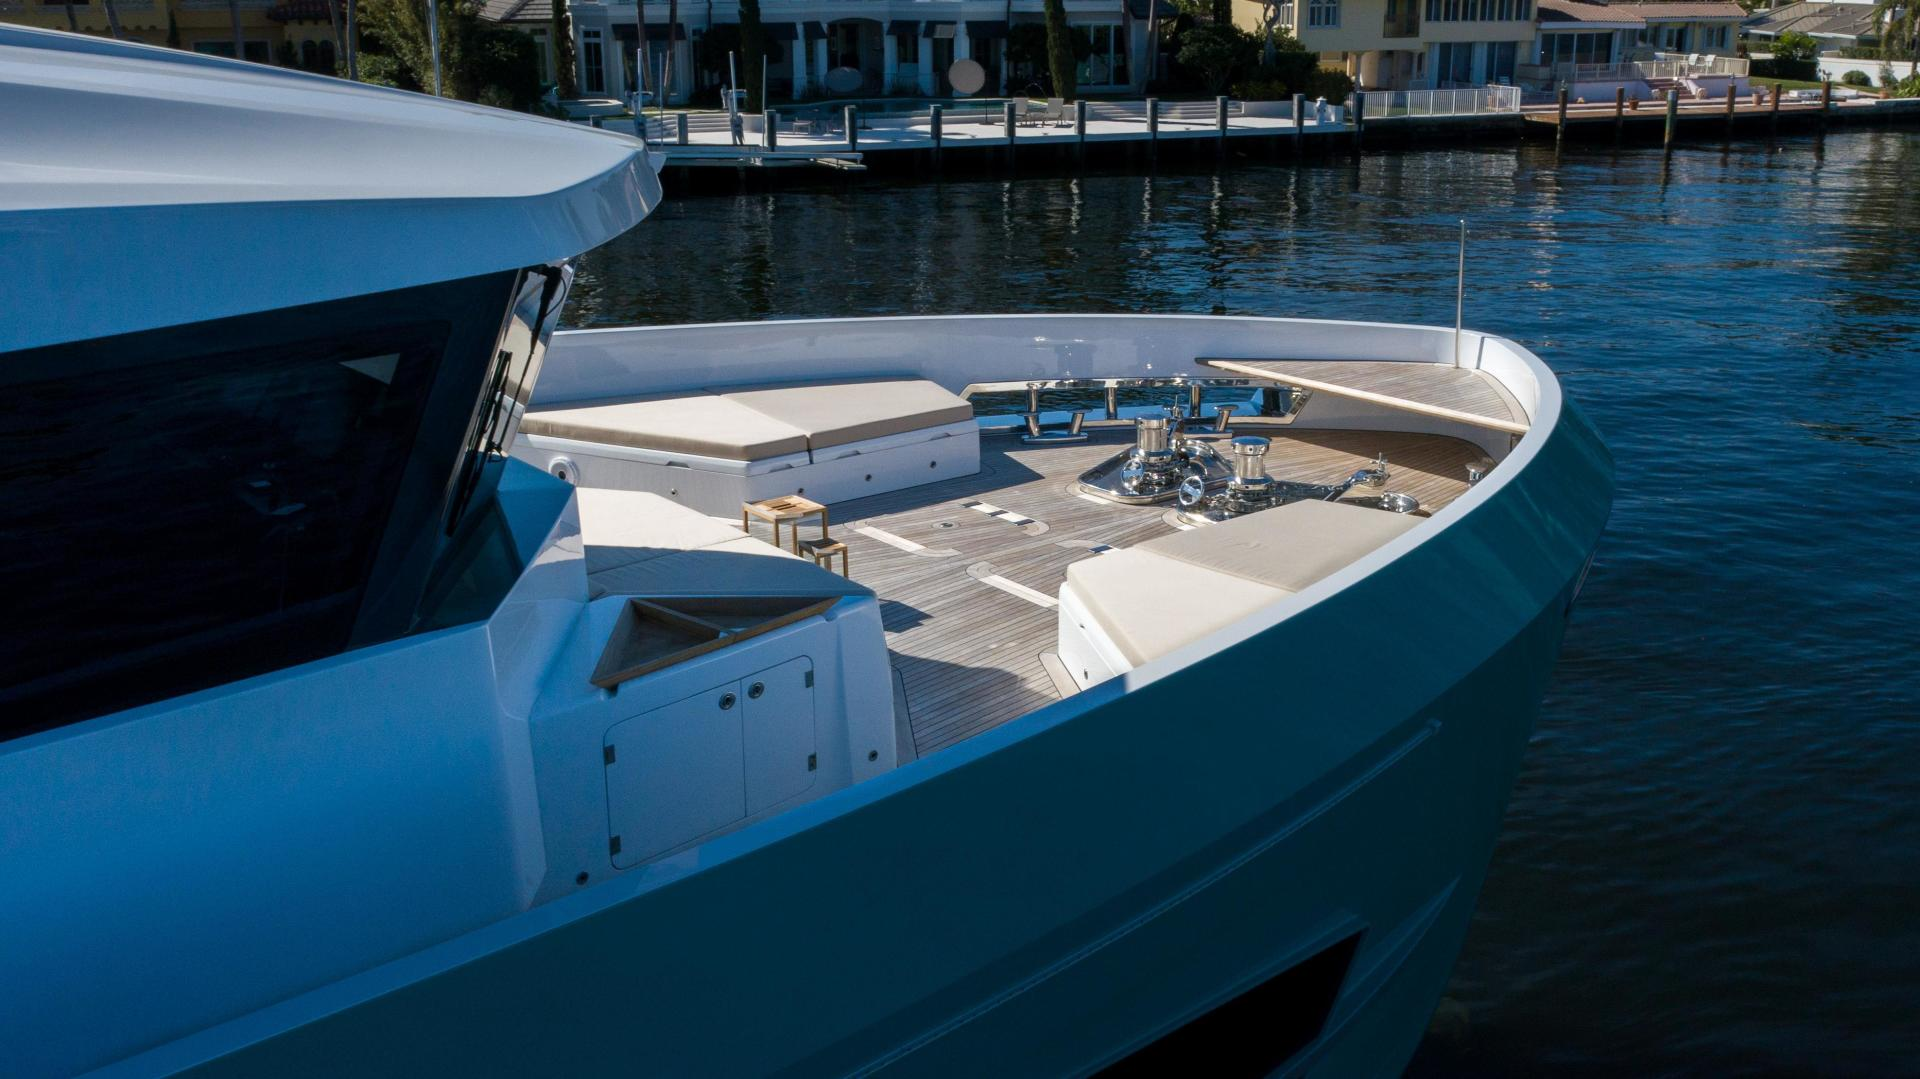 Numarine-32XP 2020-7 Diamonds Fort Lauderdale-Florida-United States-1629341 | Thumbnail